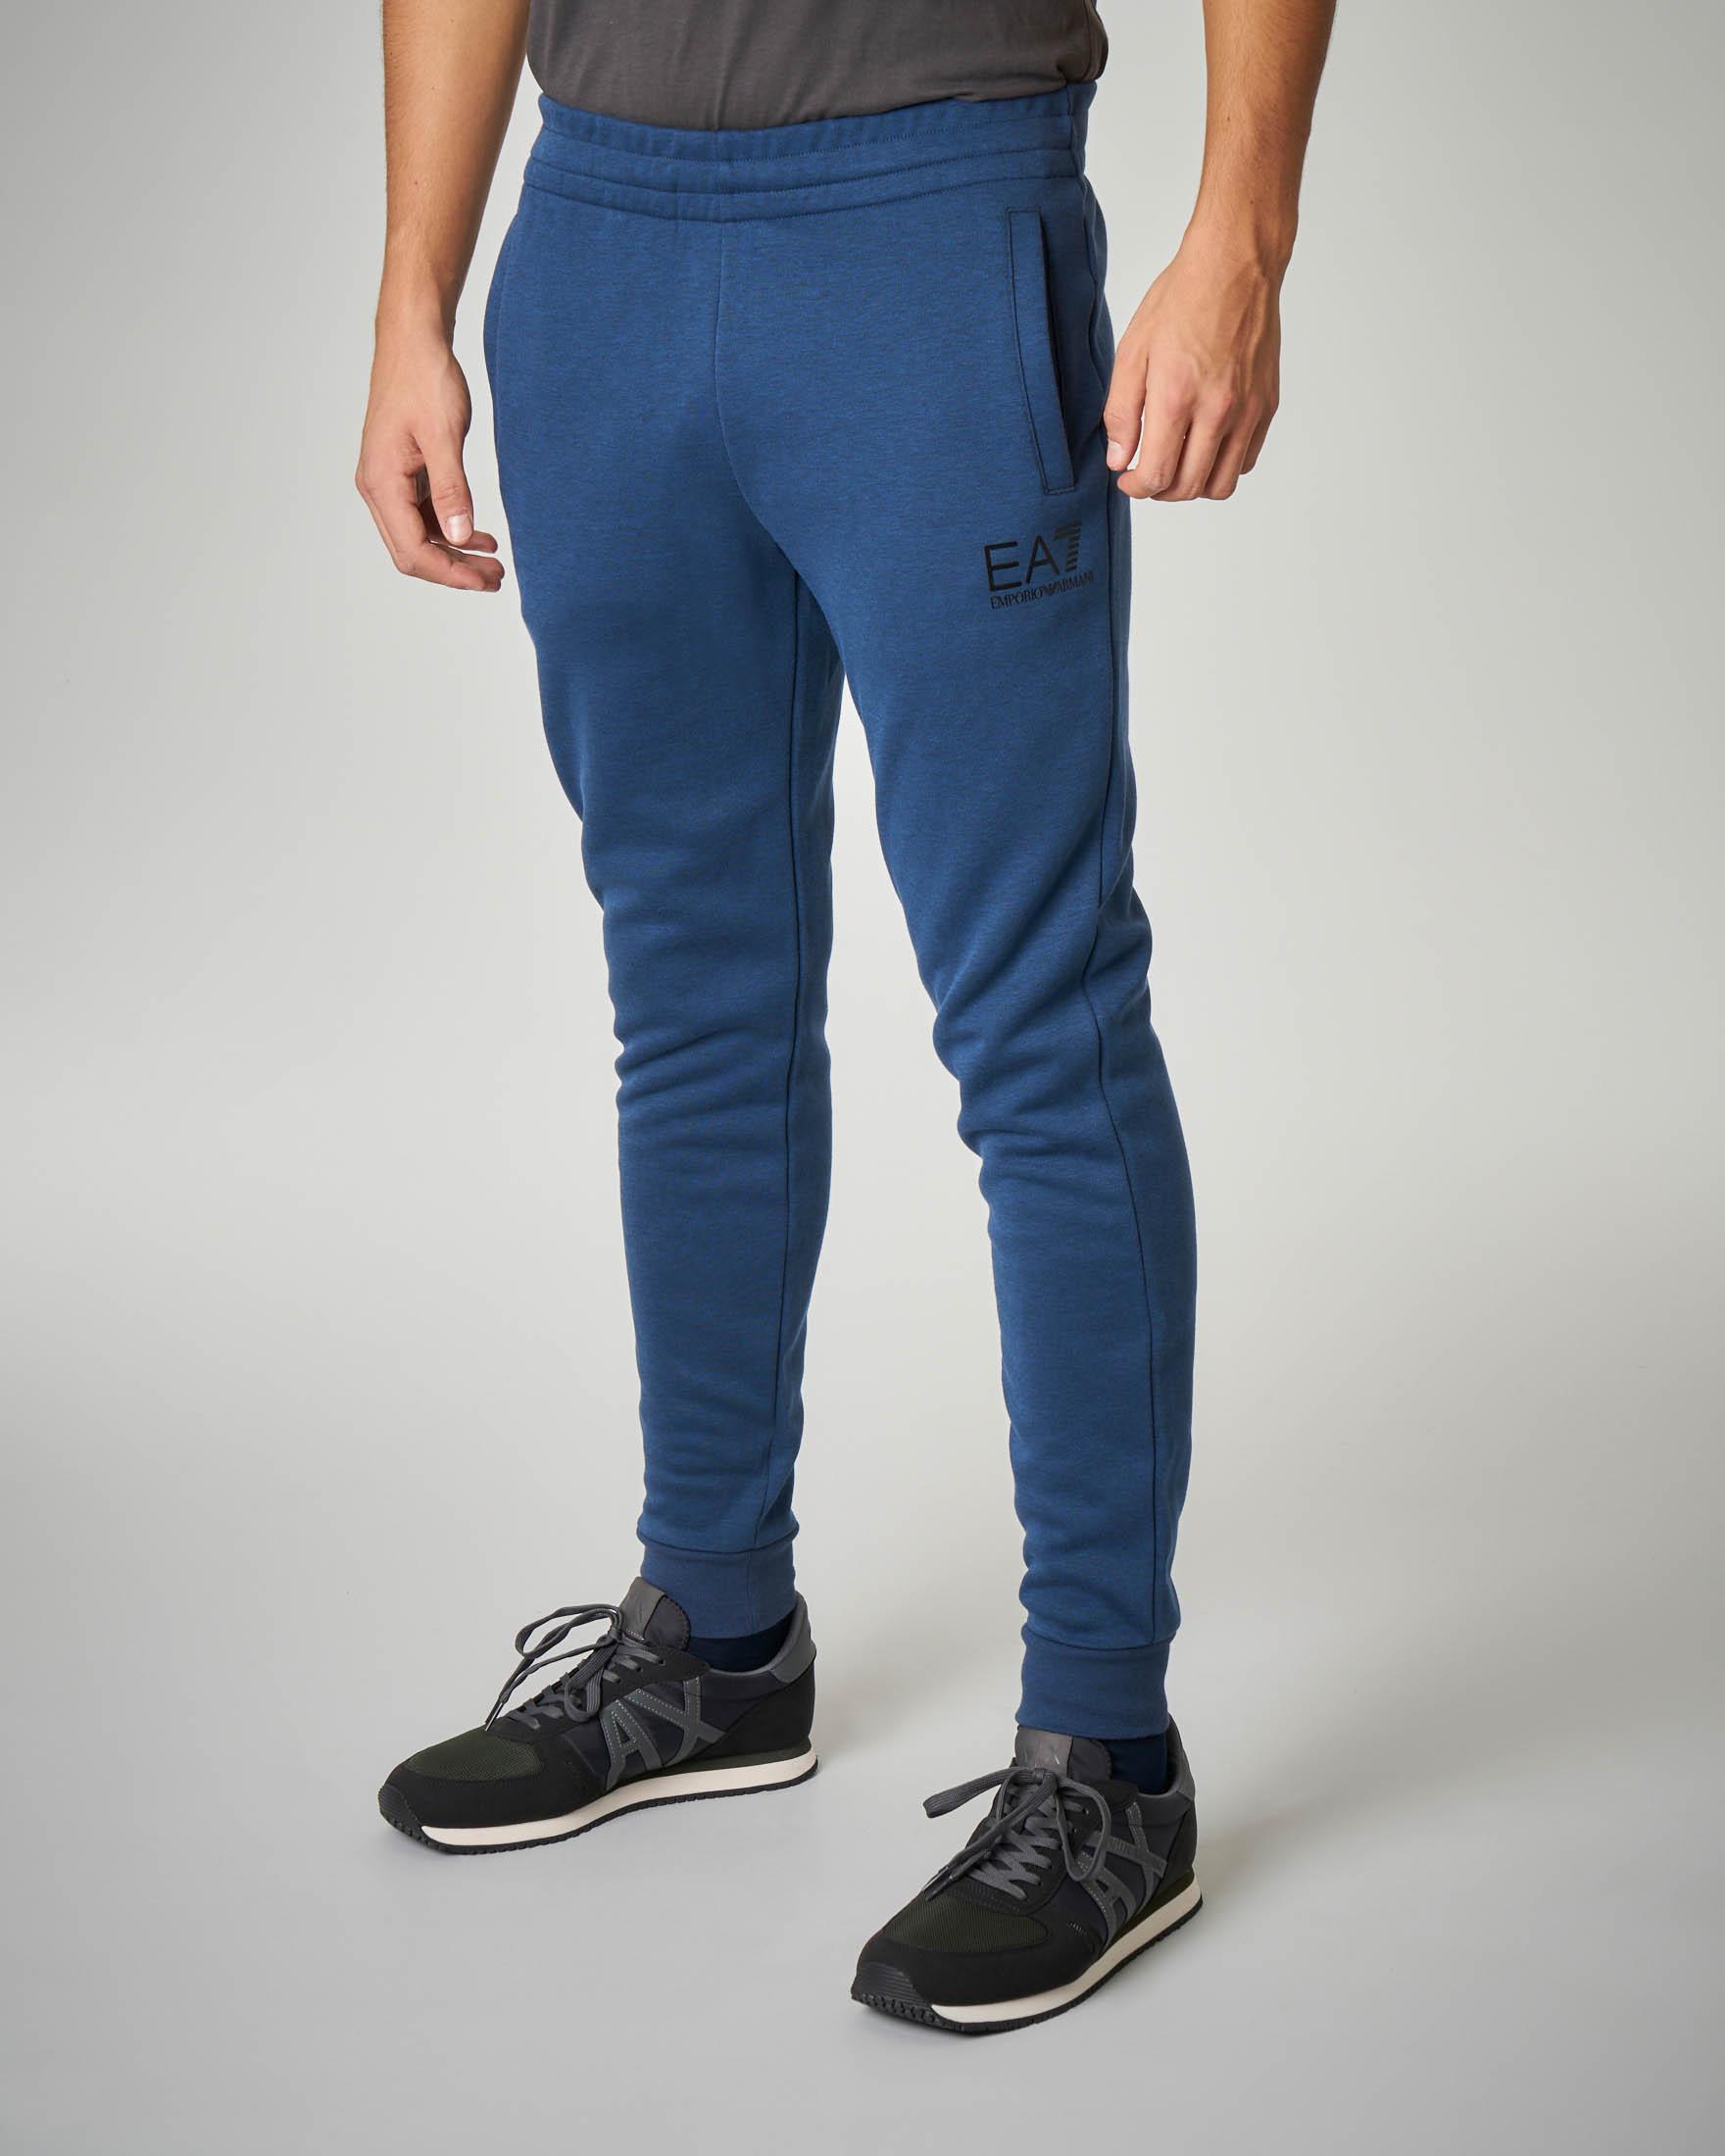 Pantalone blu melange in felpa leggera